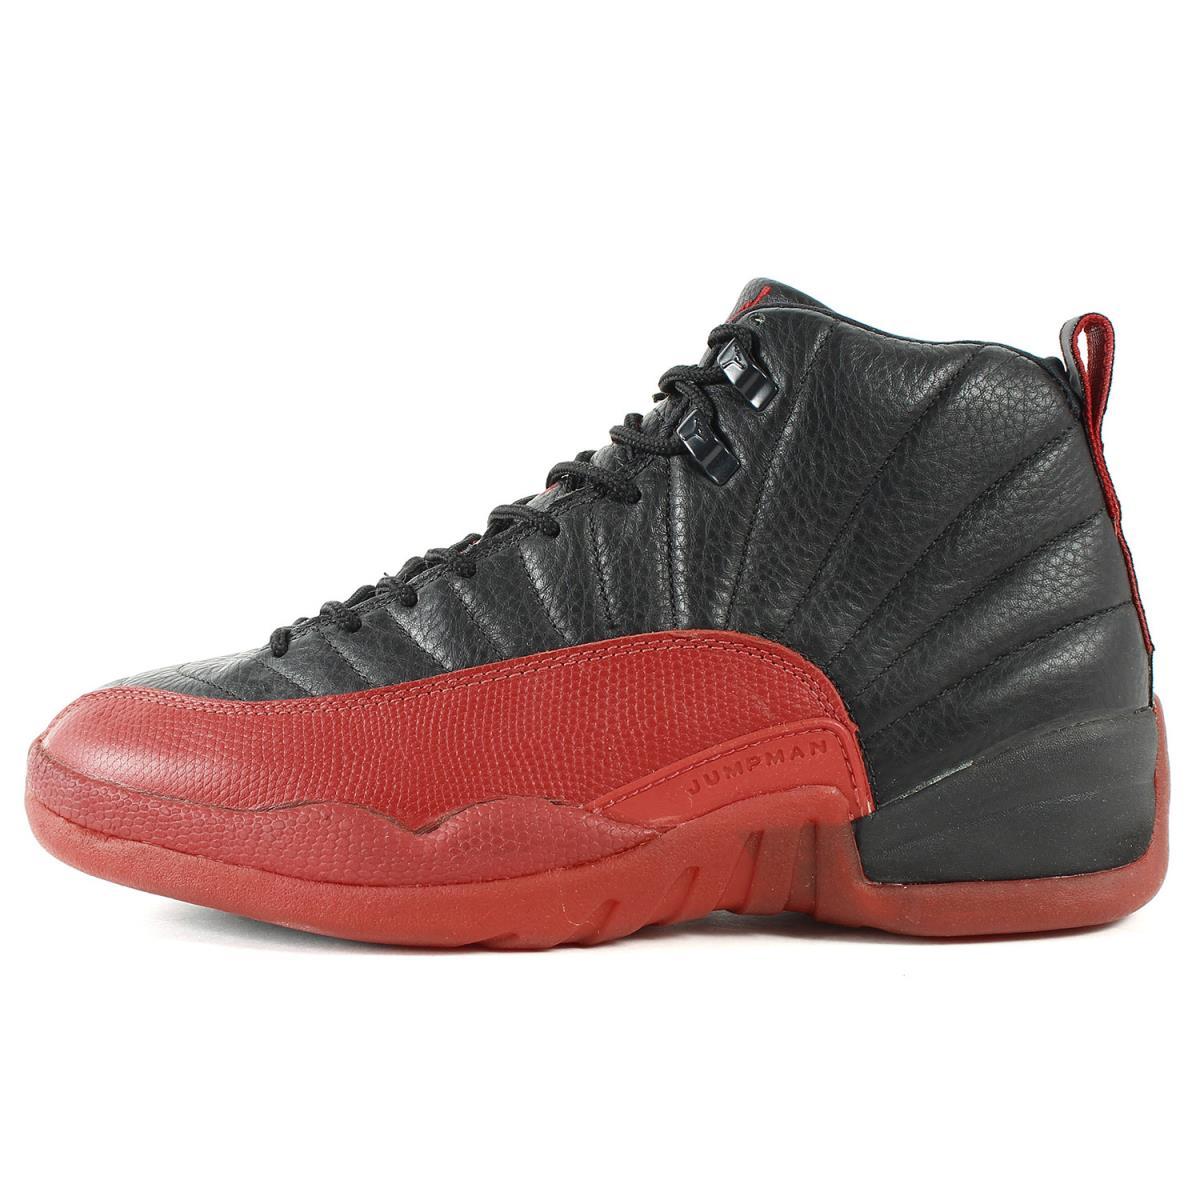 best service 04950 39a5b NIKE (Nike) AIR JORDAN 12 (/ 130,690-061 made in 1996) black X bar city red  US11(29cm)